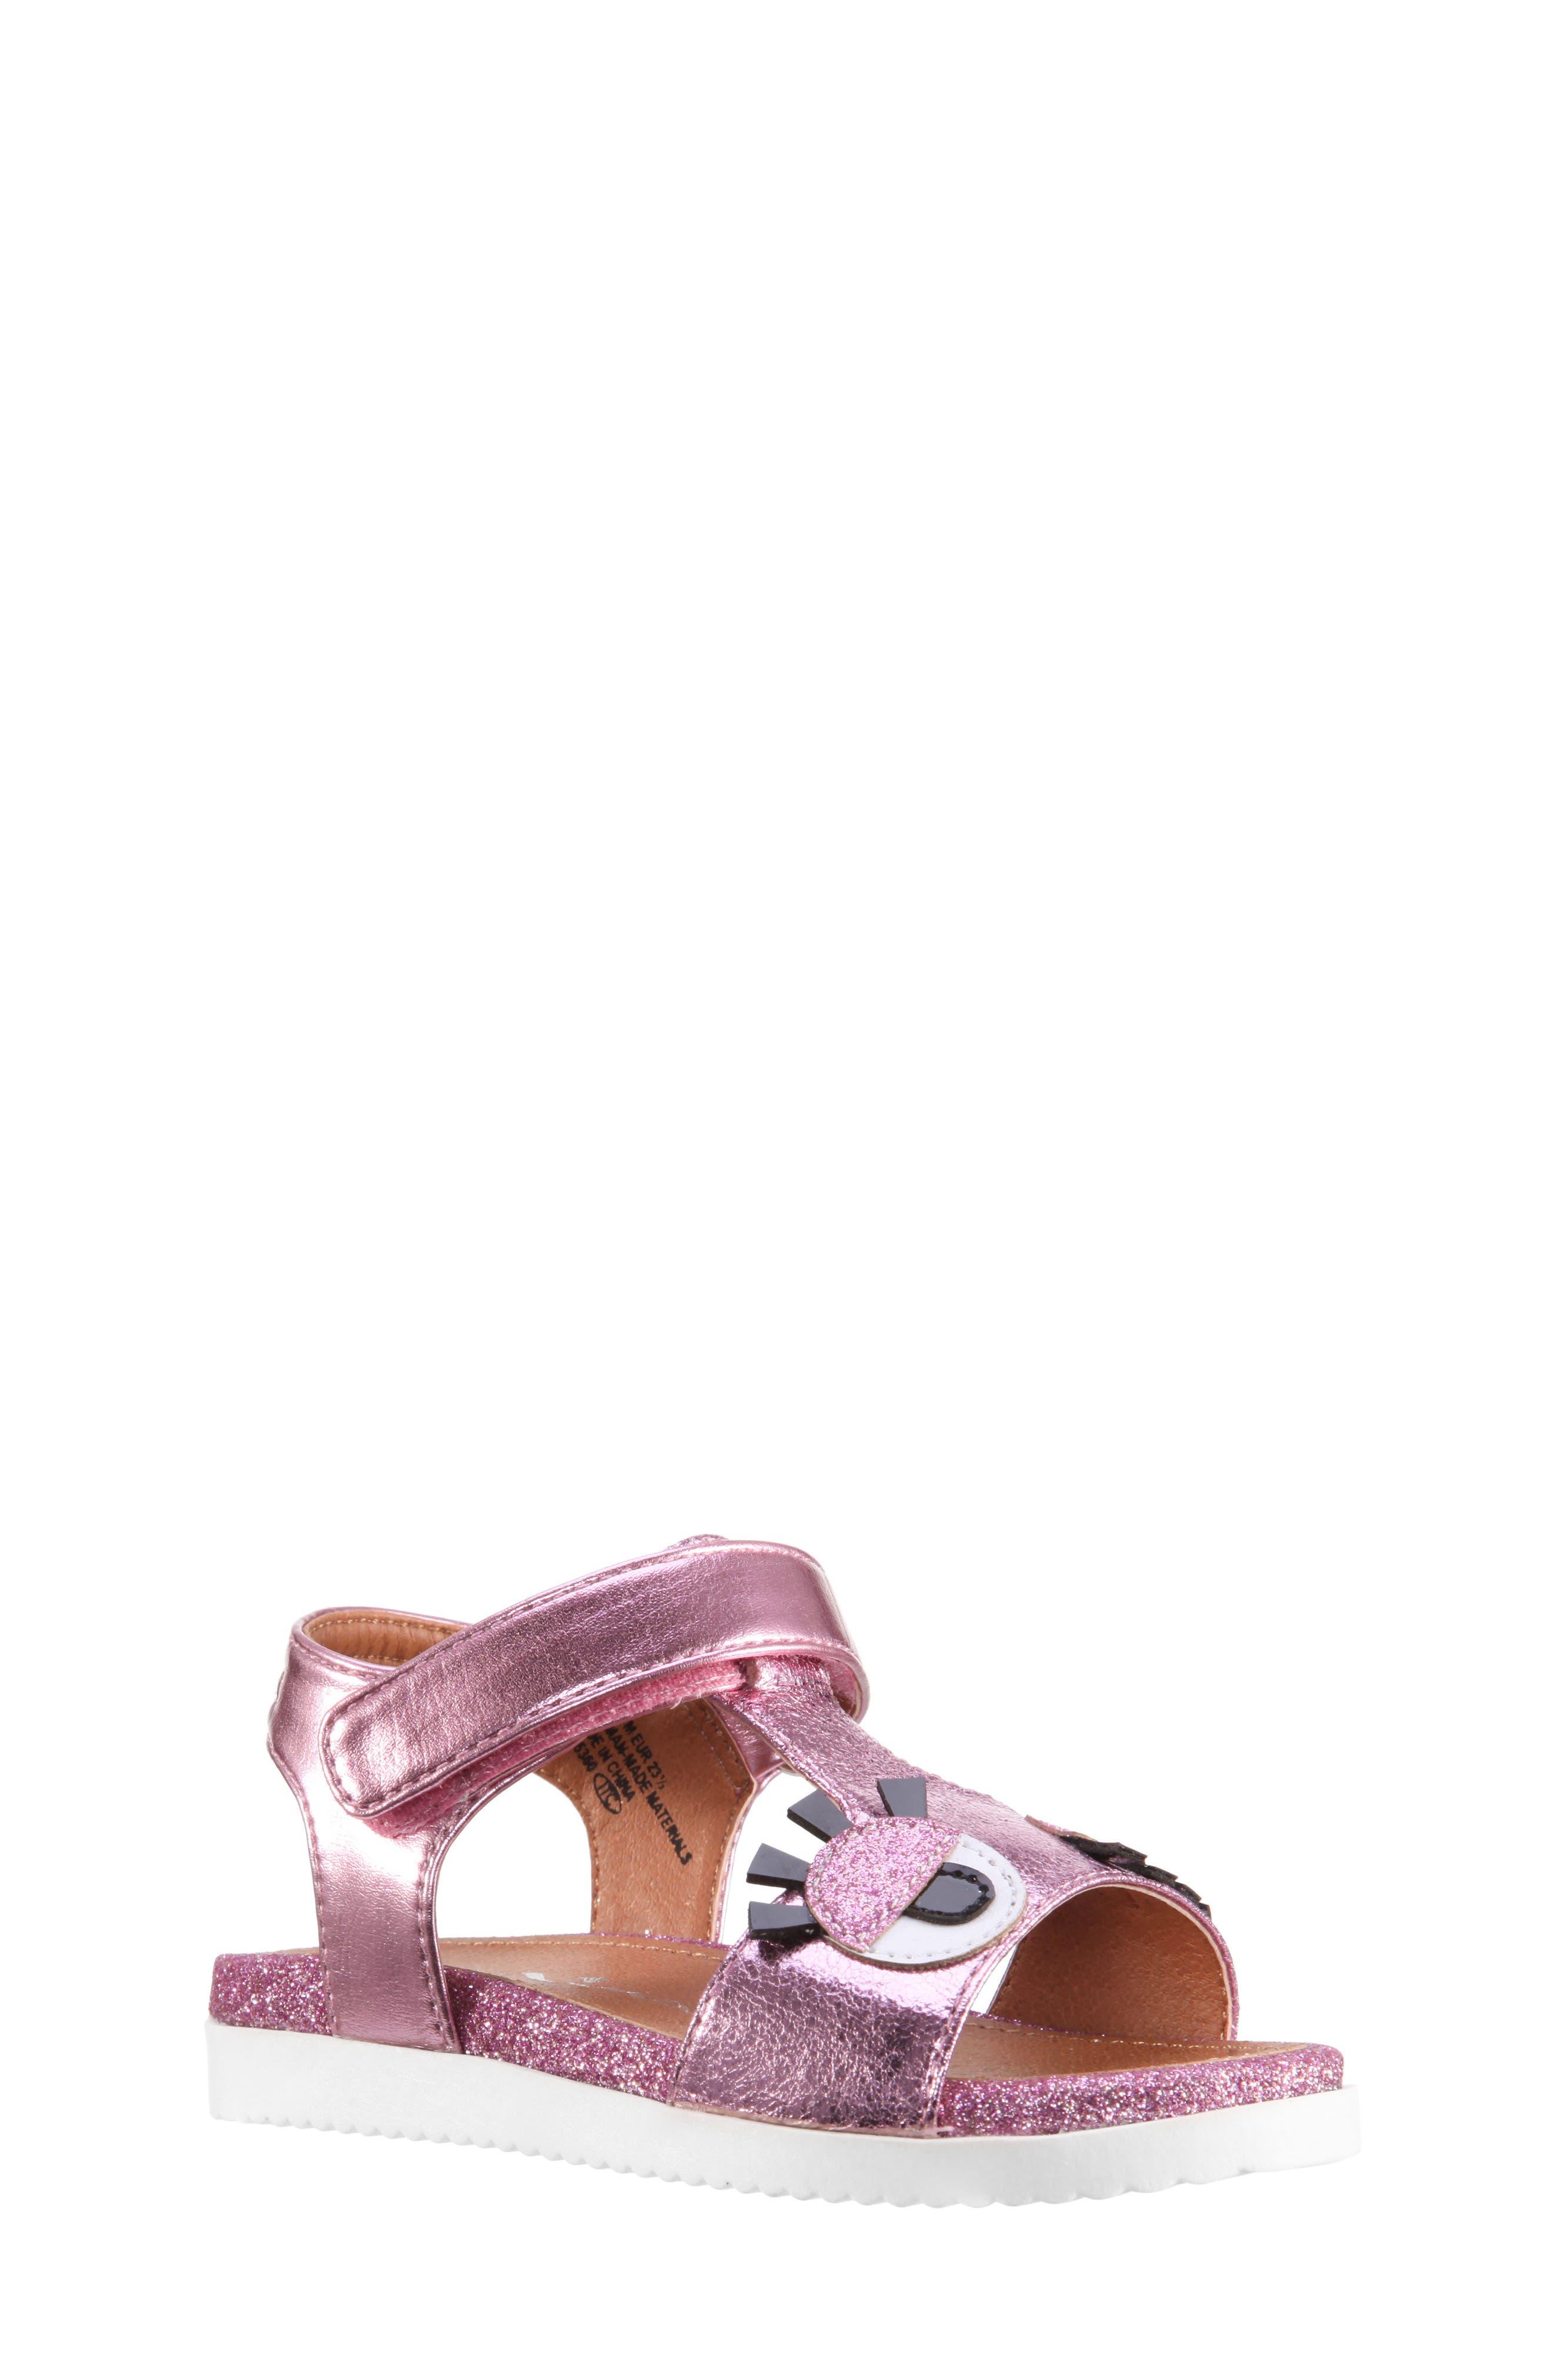 Luciella Wink Sandal,                             Main thumbnail 1, color,                             695